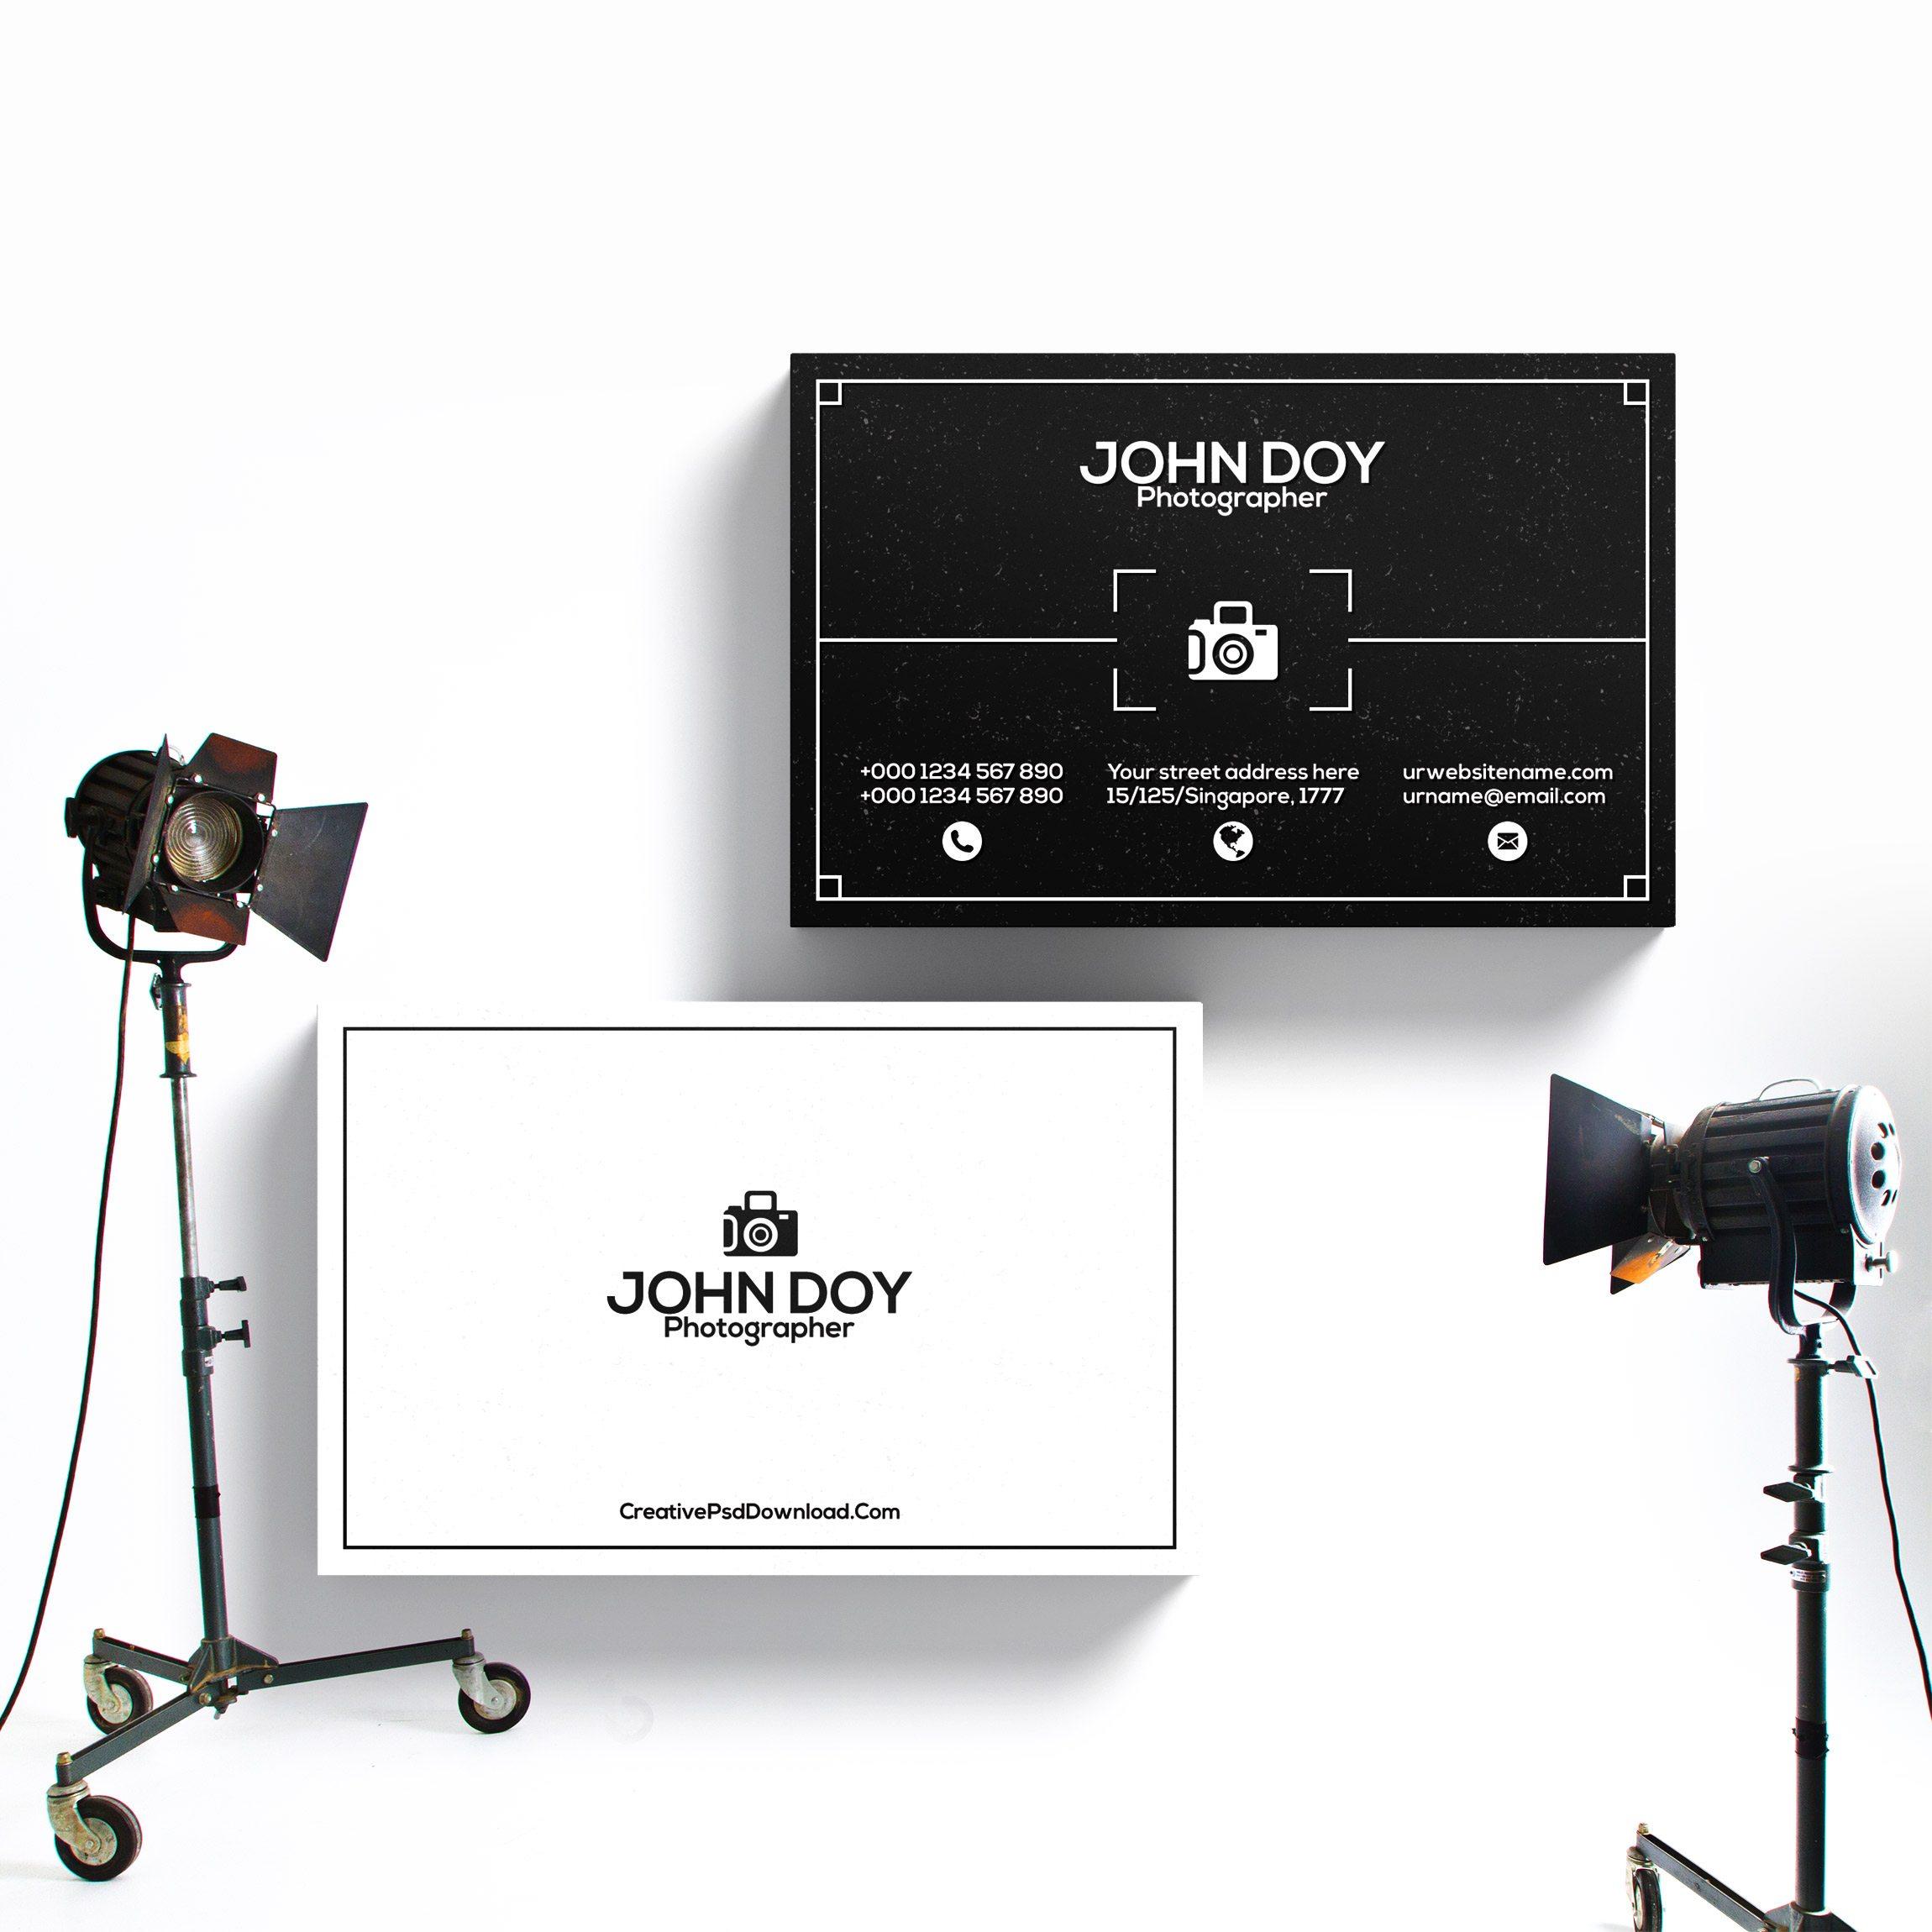 Premium Photographer Business Card Template